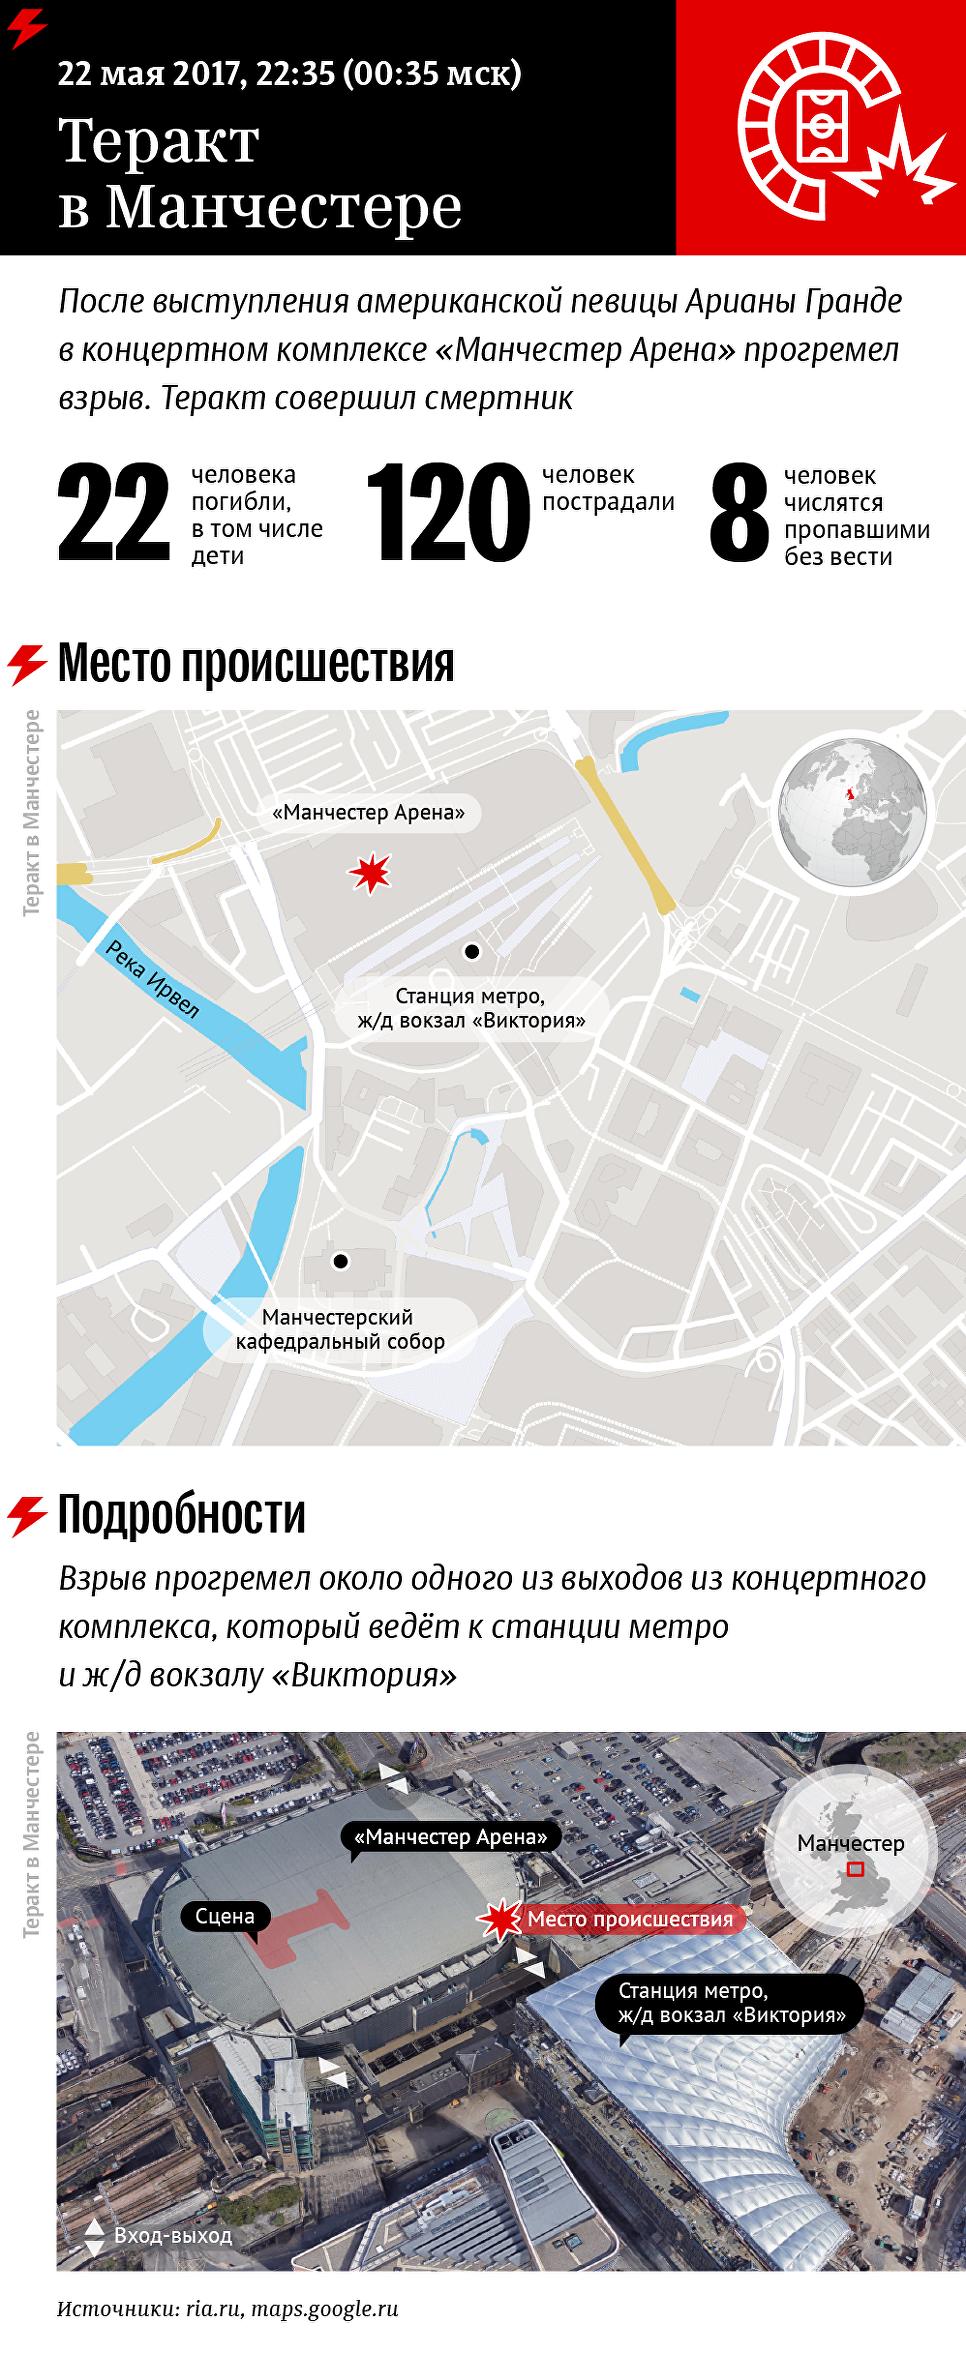 https://cdn5.img.ria.ru/images/149491/78/1494917880.png